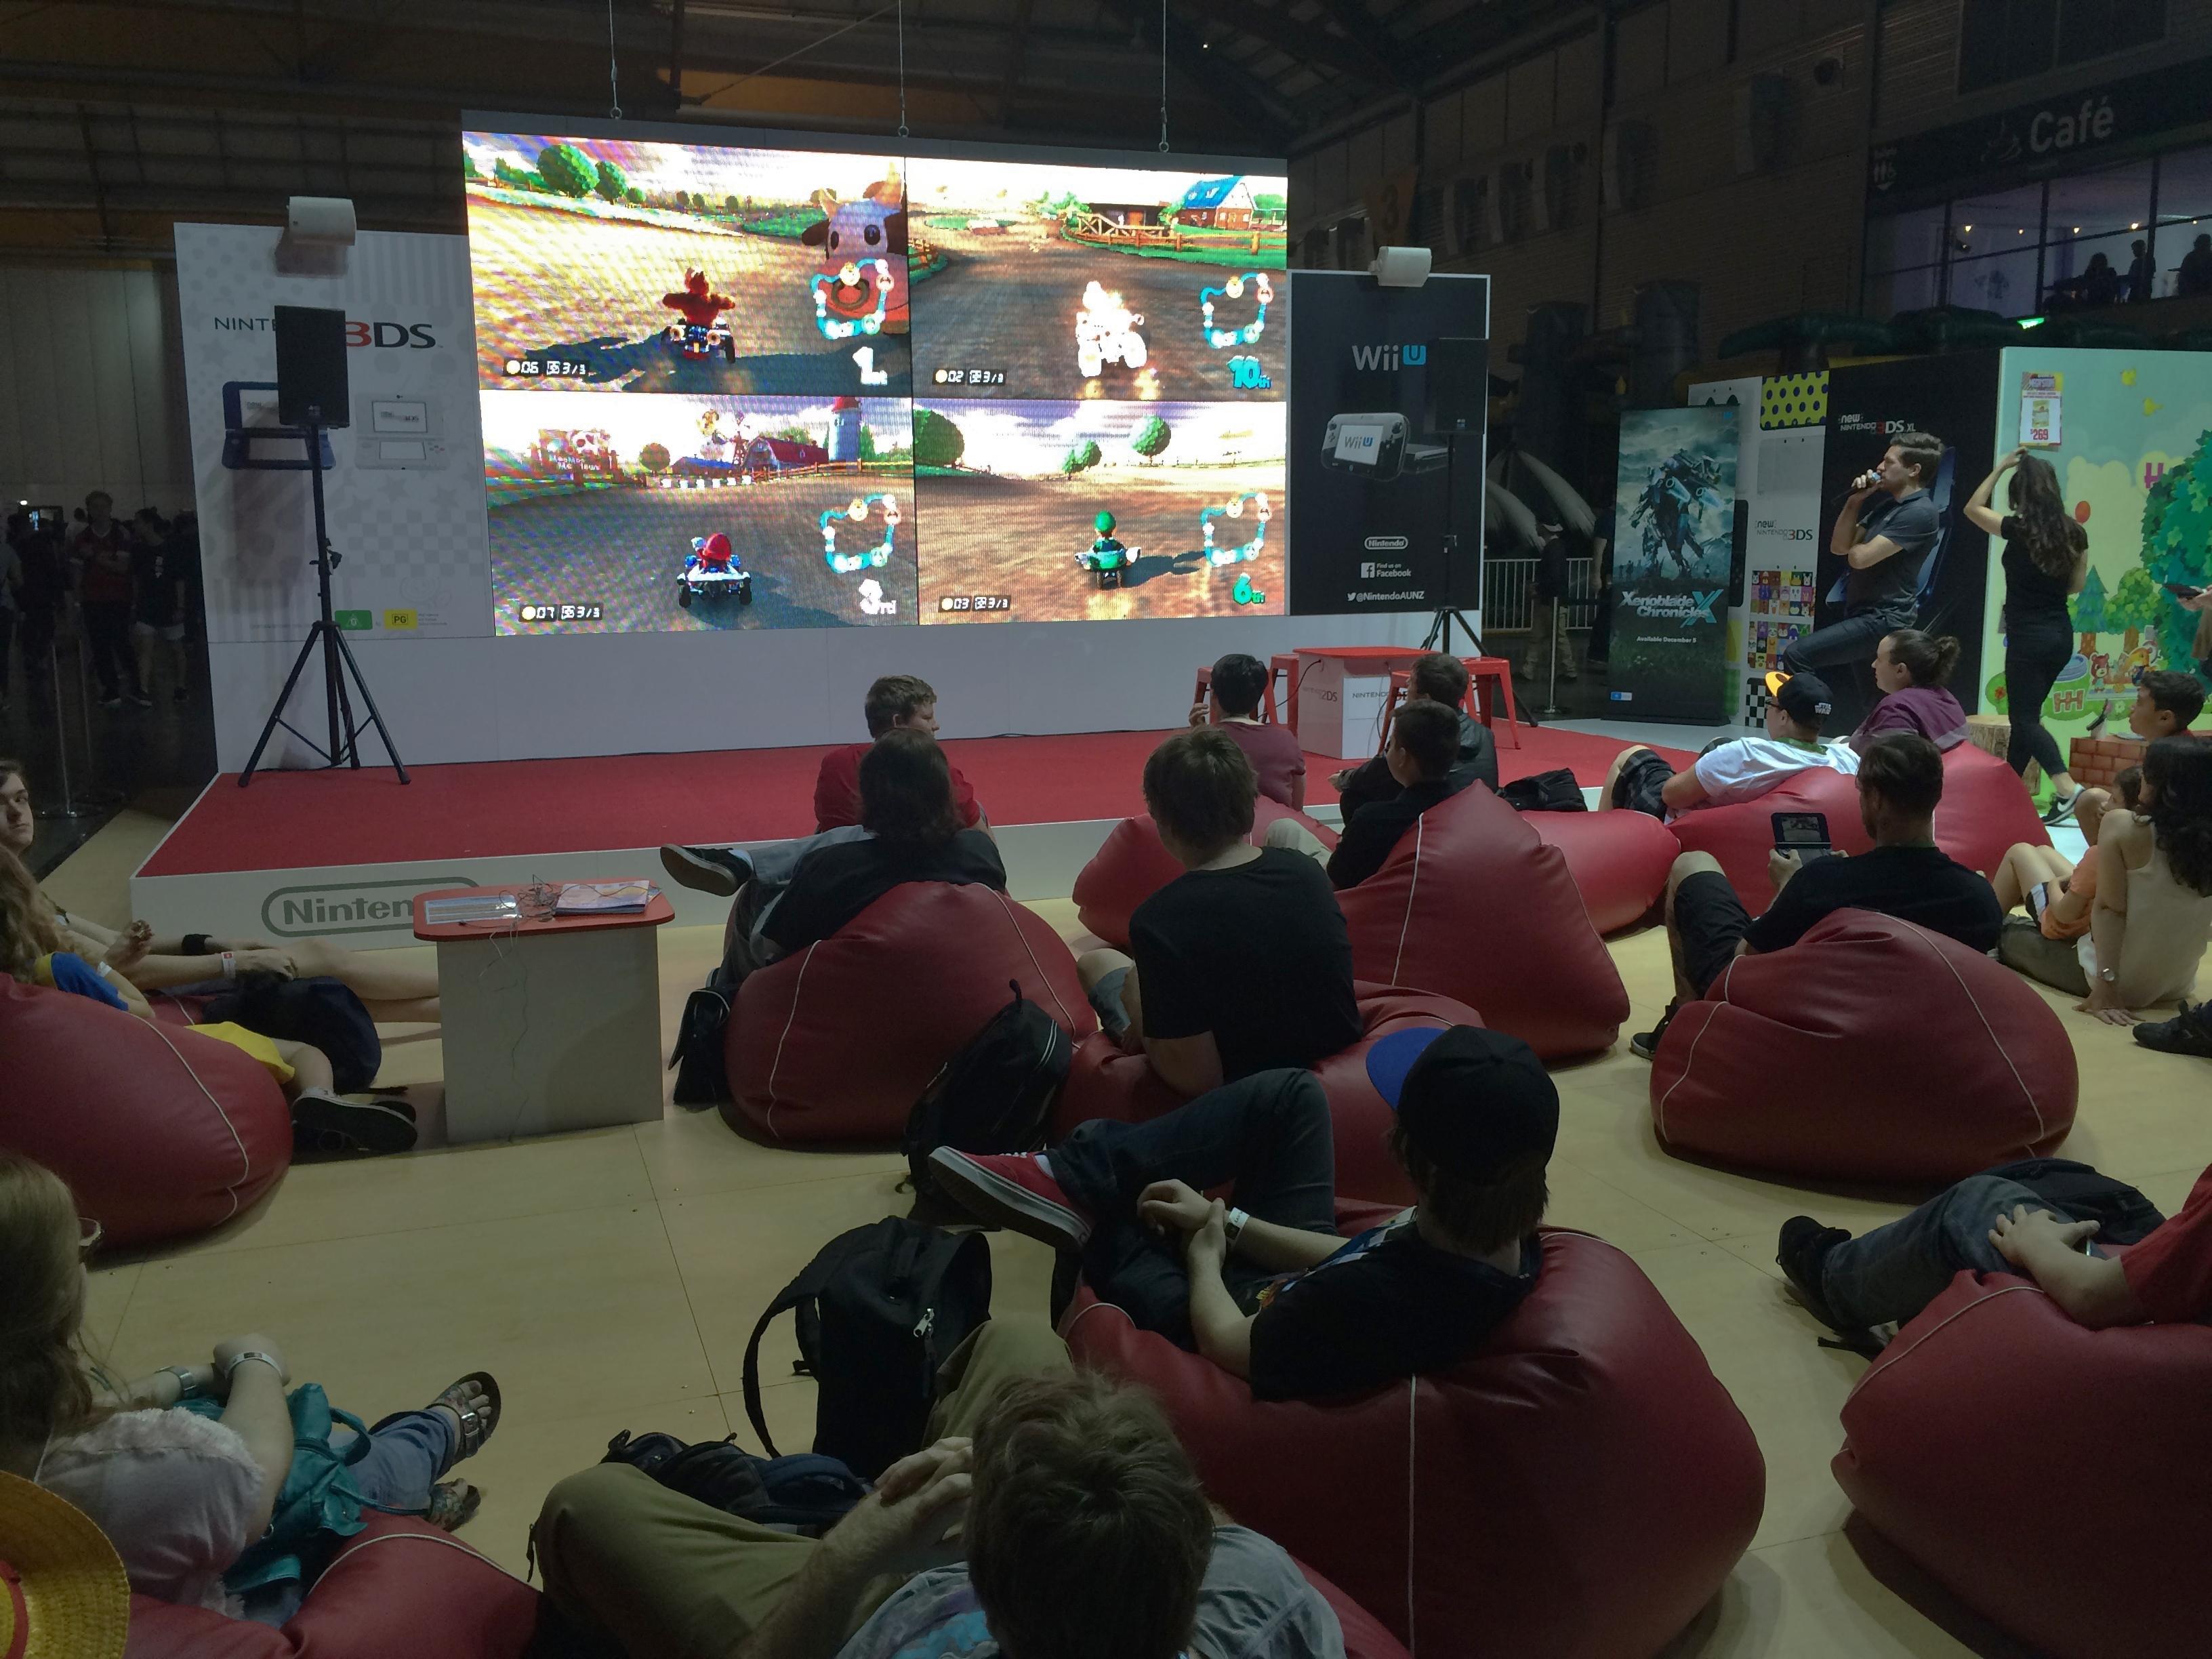 https://upload.wikimedia.org/wikipedia/commons/e/ec/EB_Games_Expo_2015_-_Mario_Kart_8_Nintendo_Stage.JPG